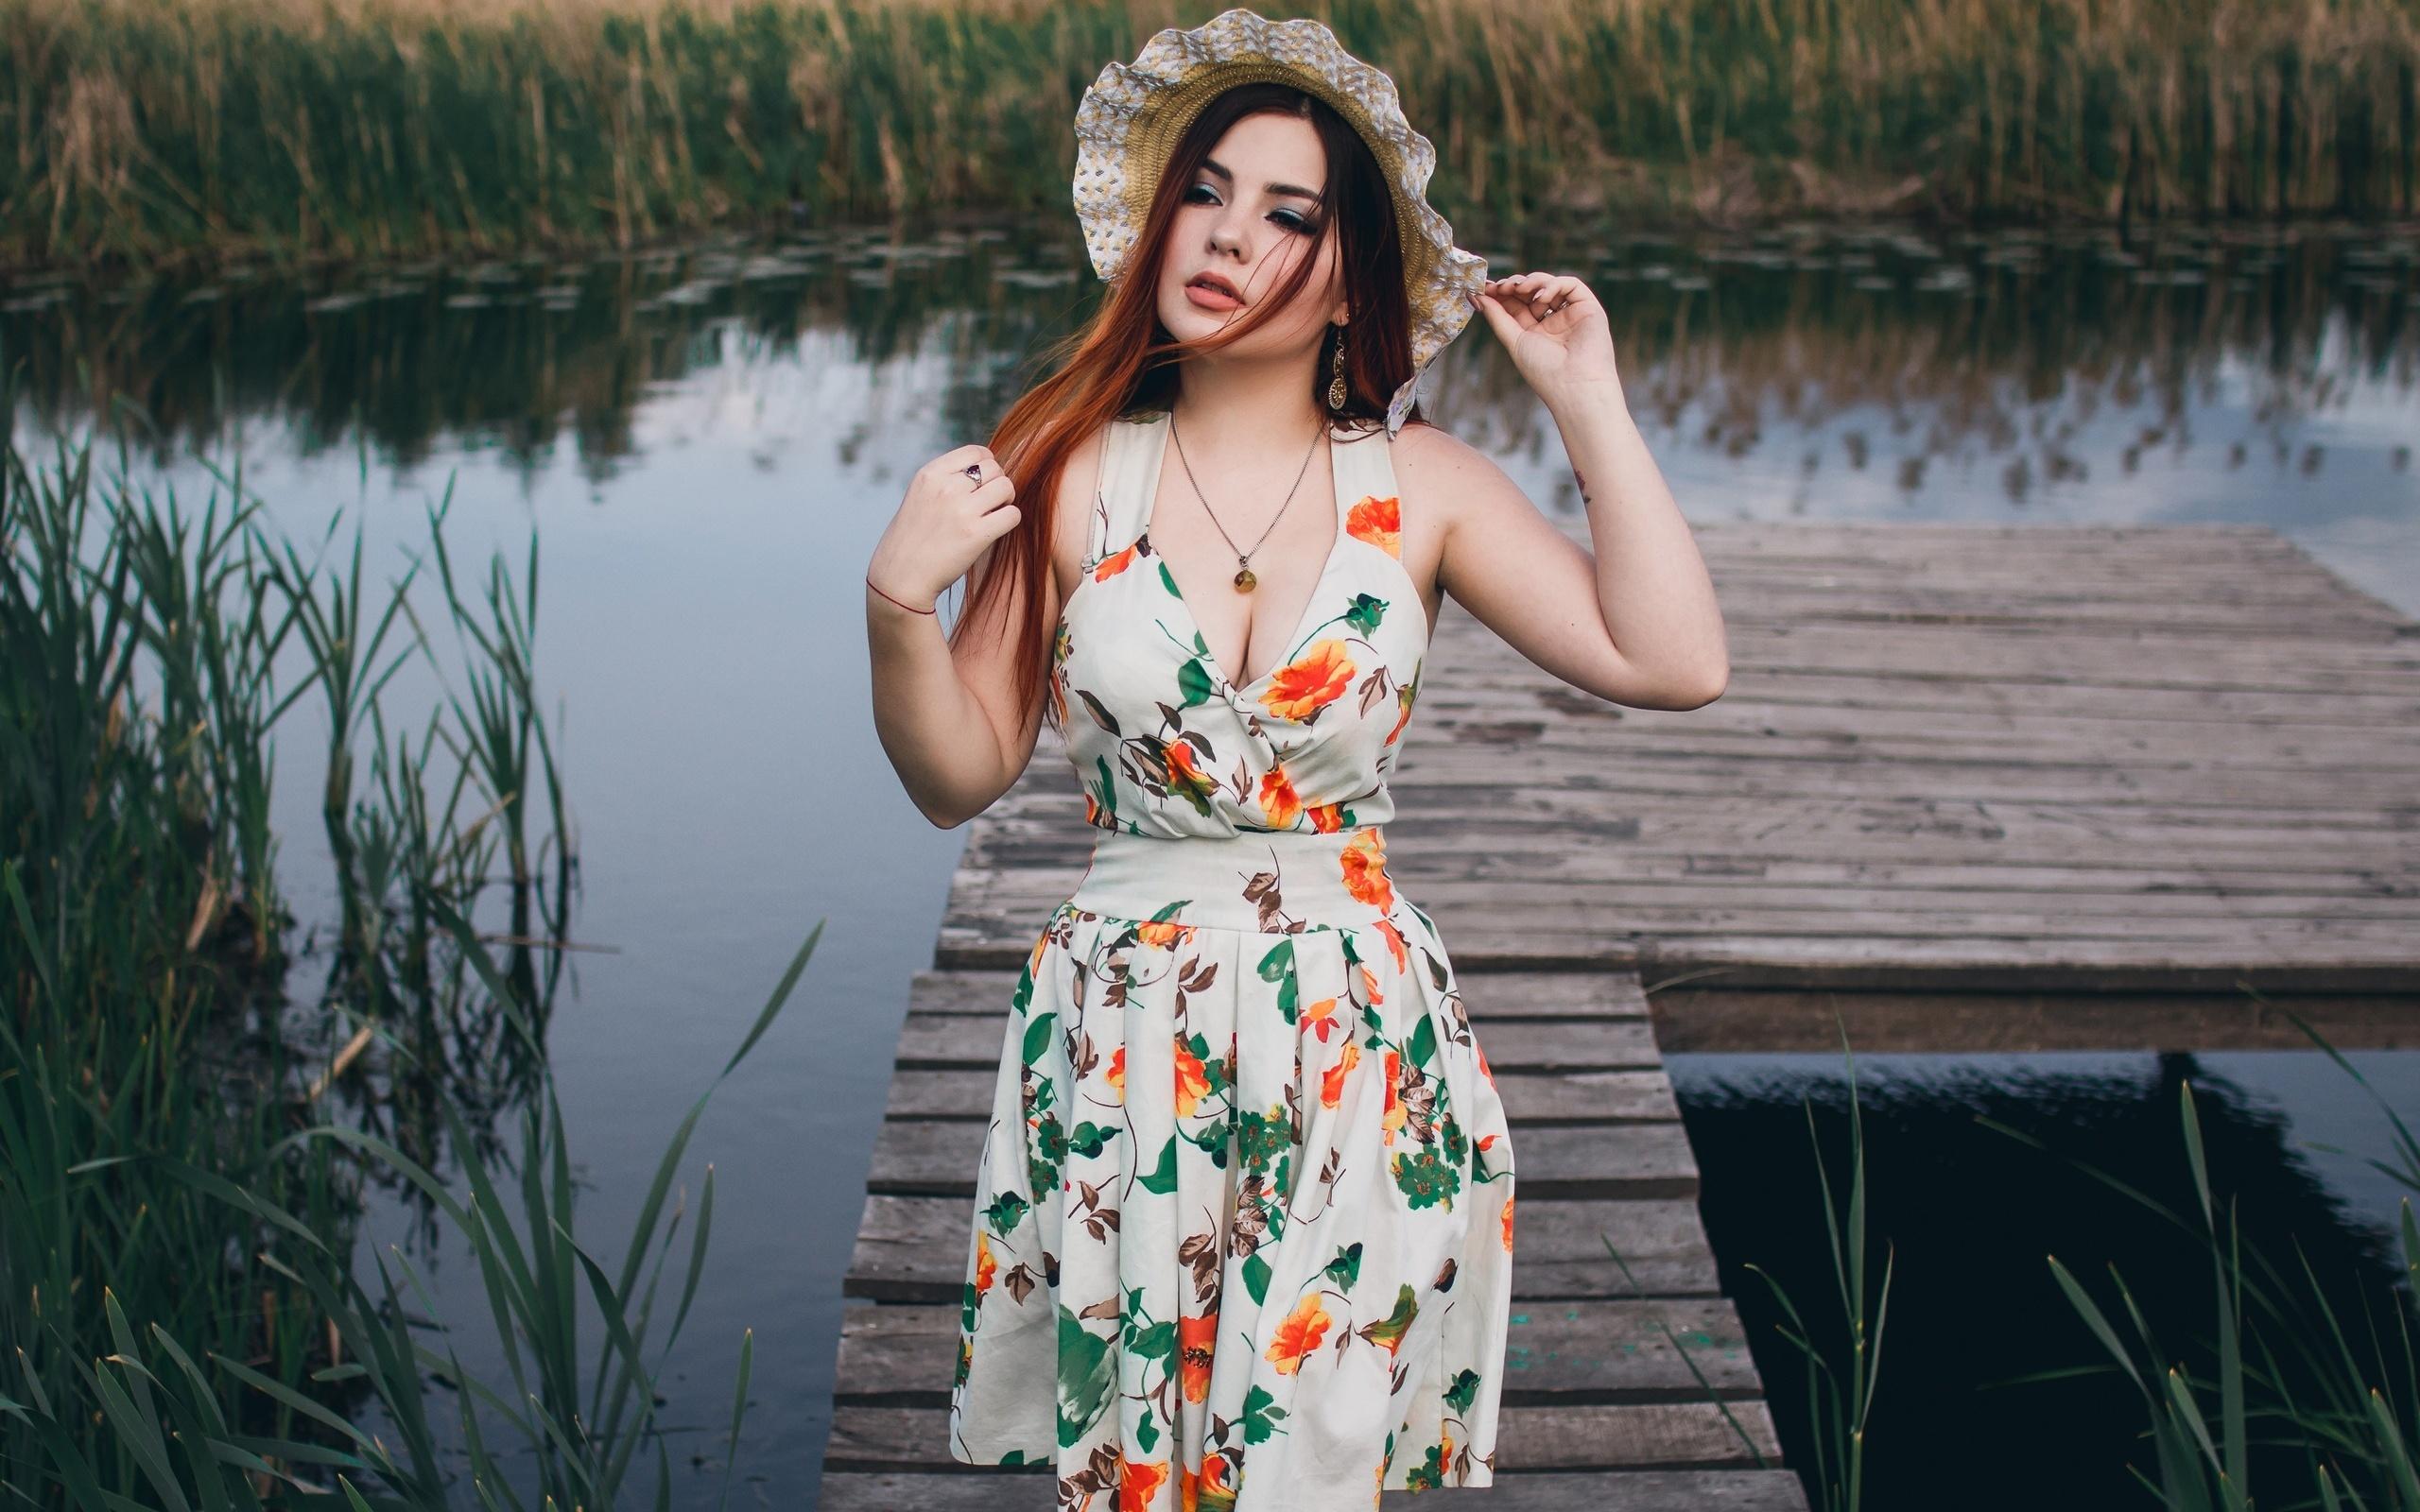 речка, лето, девушка, фотограф, алексей поликутин